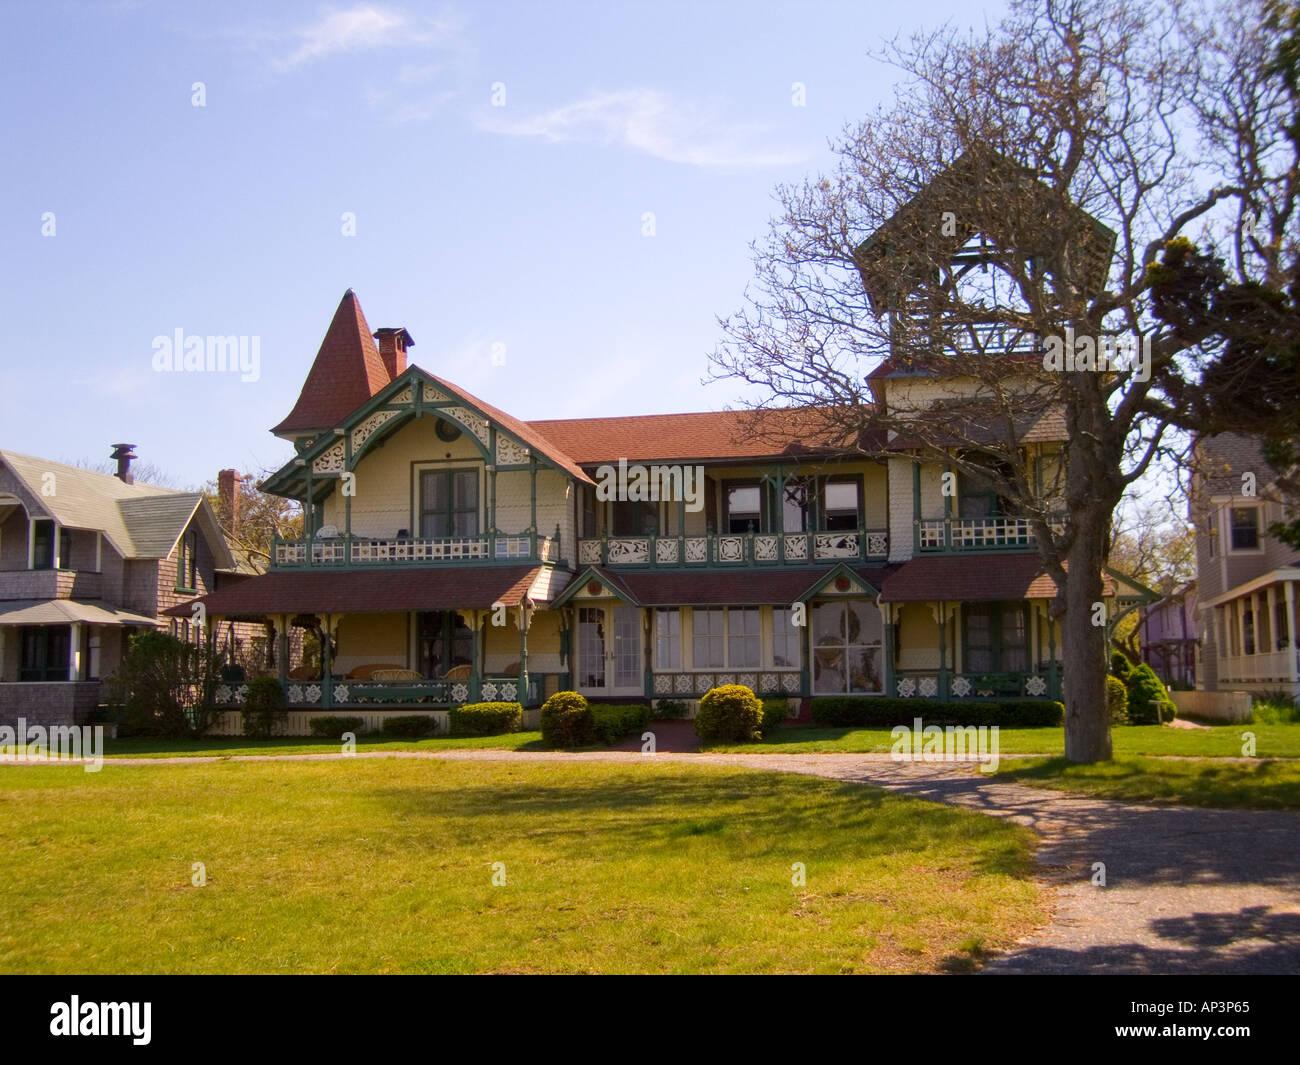 victorian gingerbread houses in oaks bluff martha's vineyard massachussetts usa - Stock Image